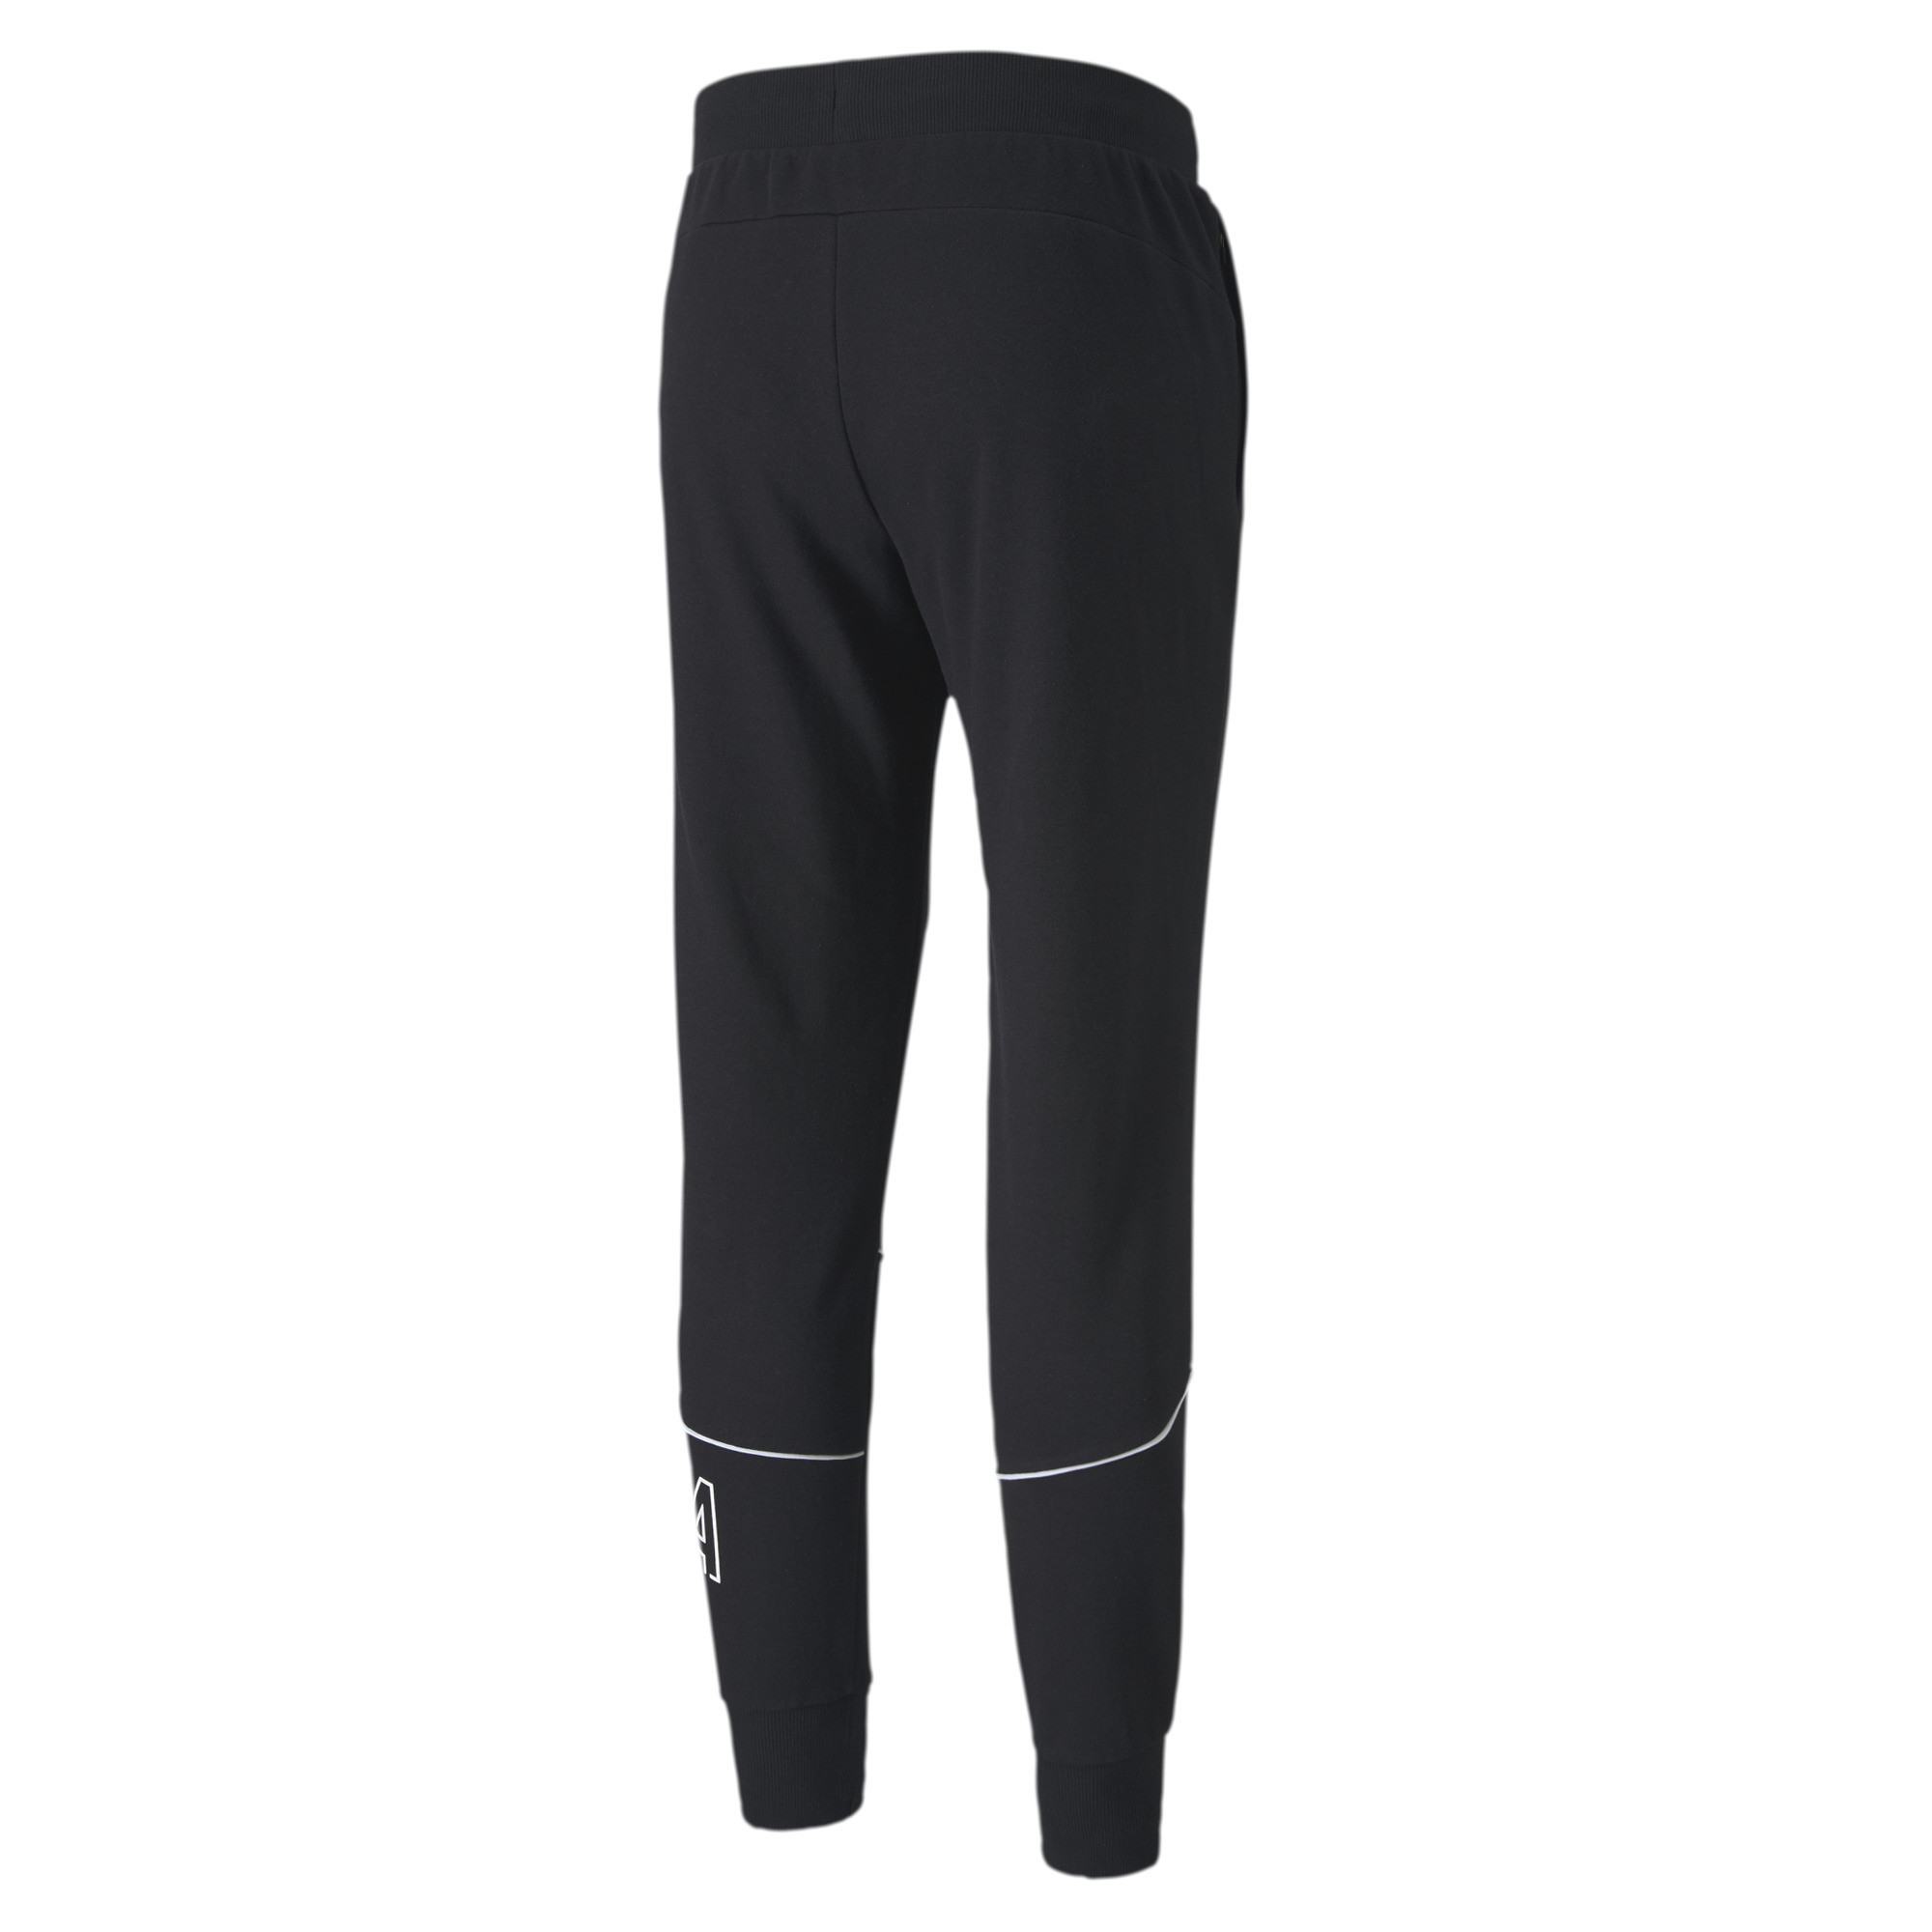 PUMA-Men-039-s-Modern-Sports-Sweatpants thumbnail 8